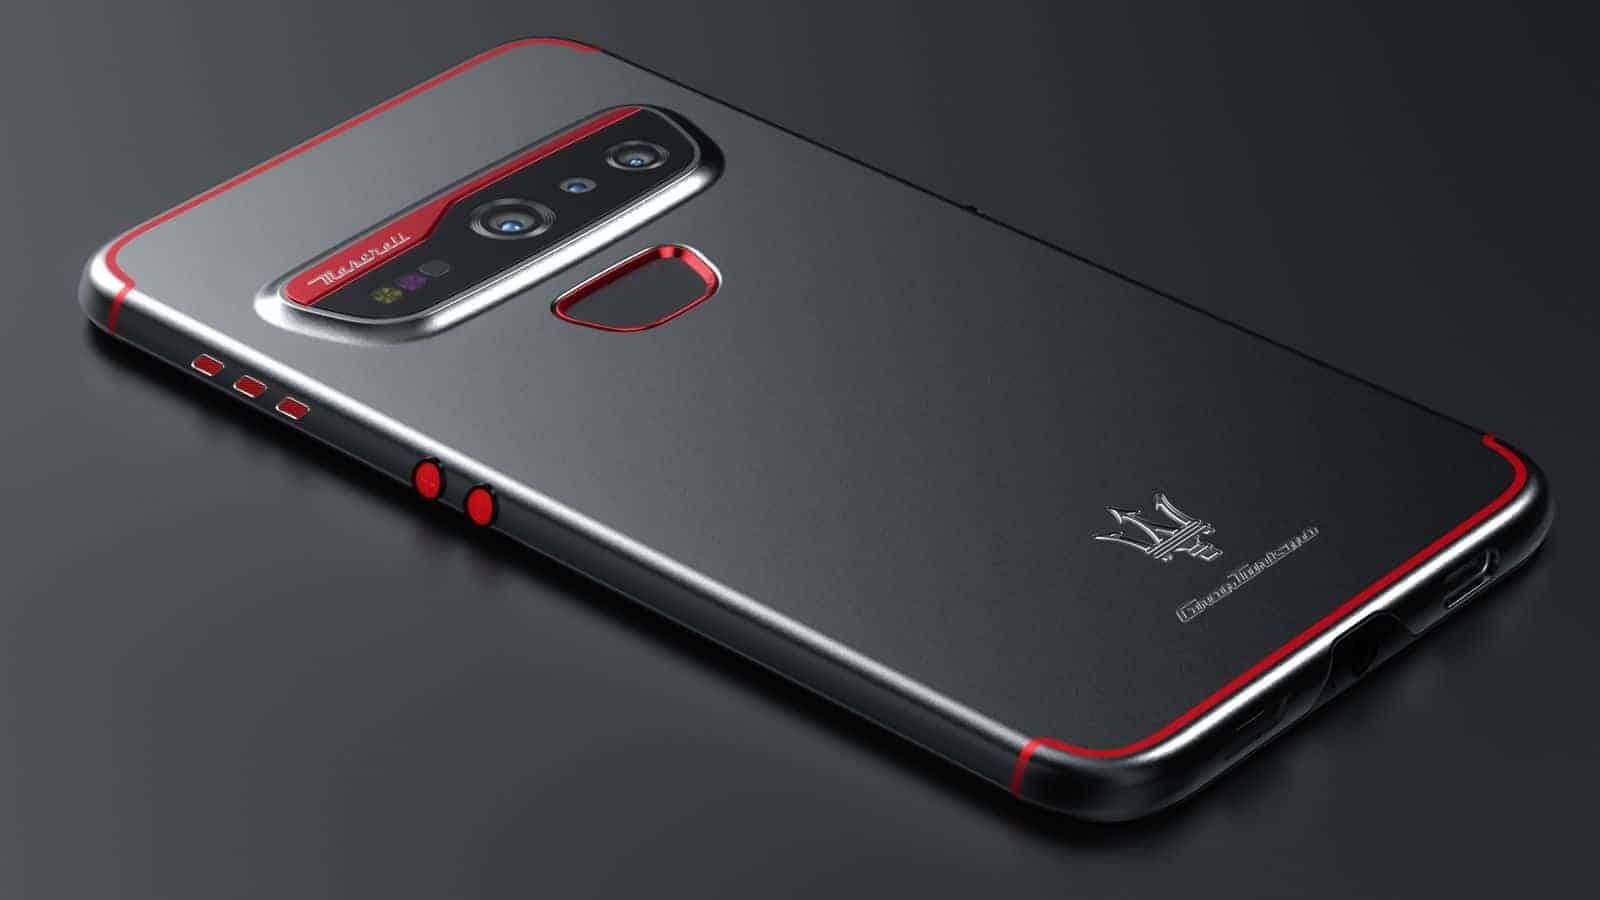 Maserati GranTurismo Concept Phone 4